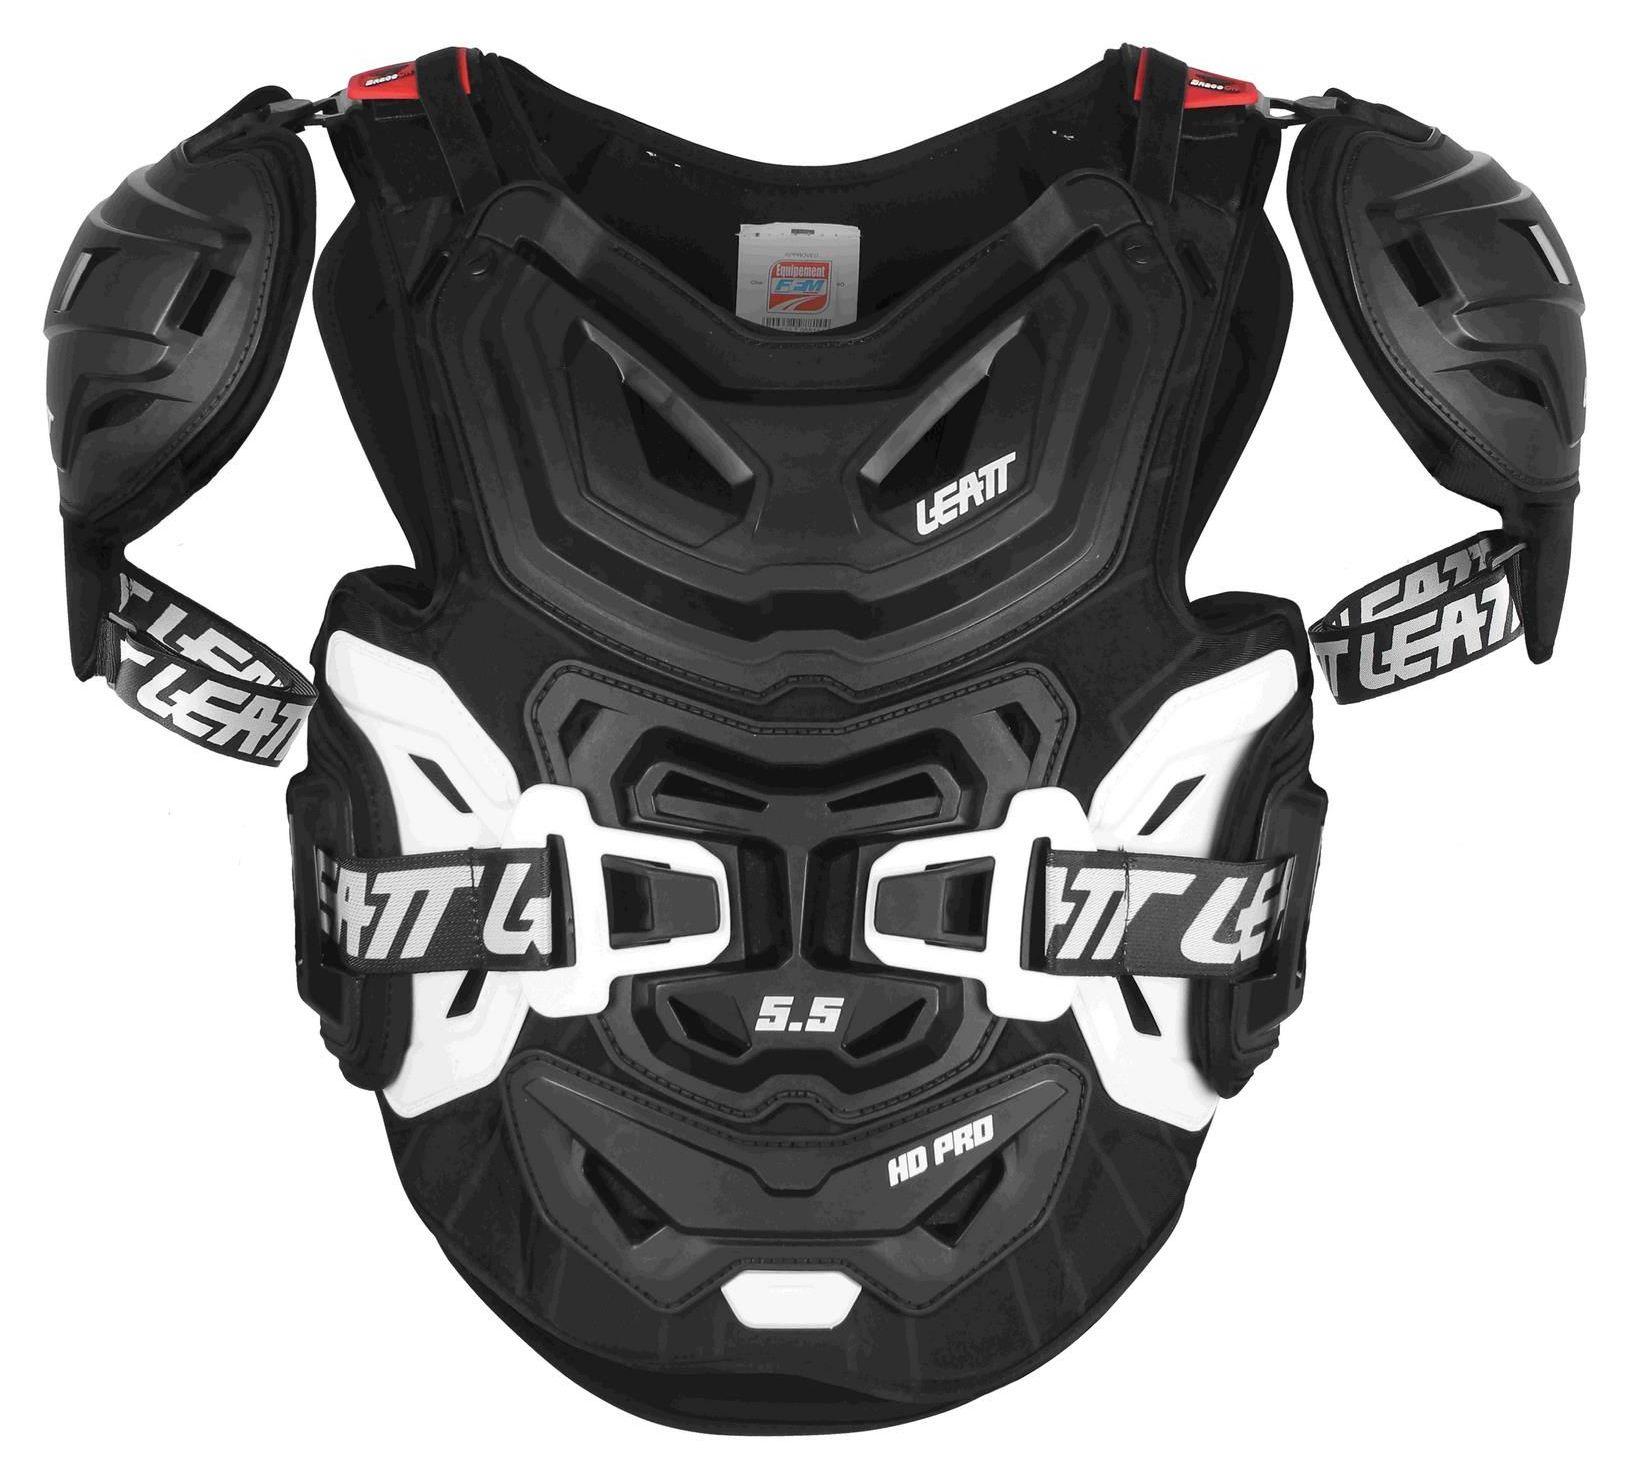 930c9a1003 Leatt Motocross Protection - Body Armor